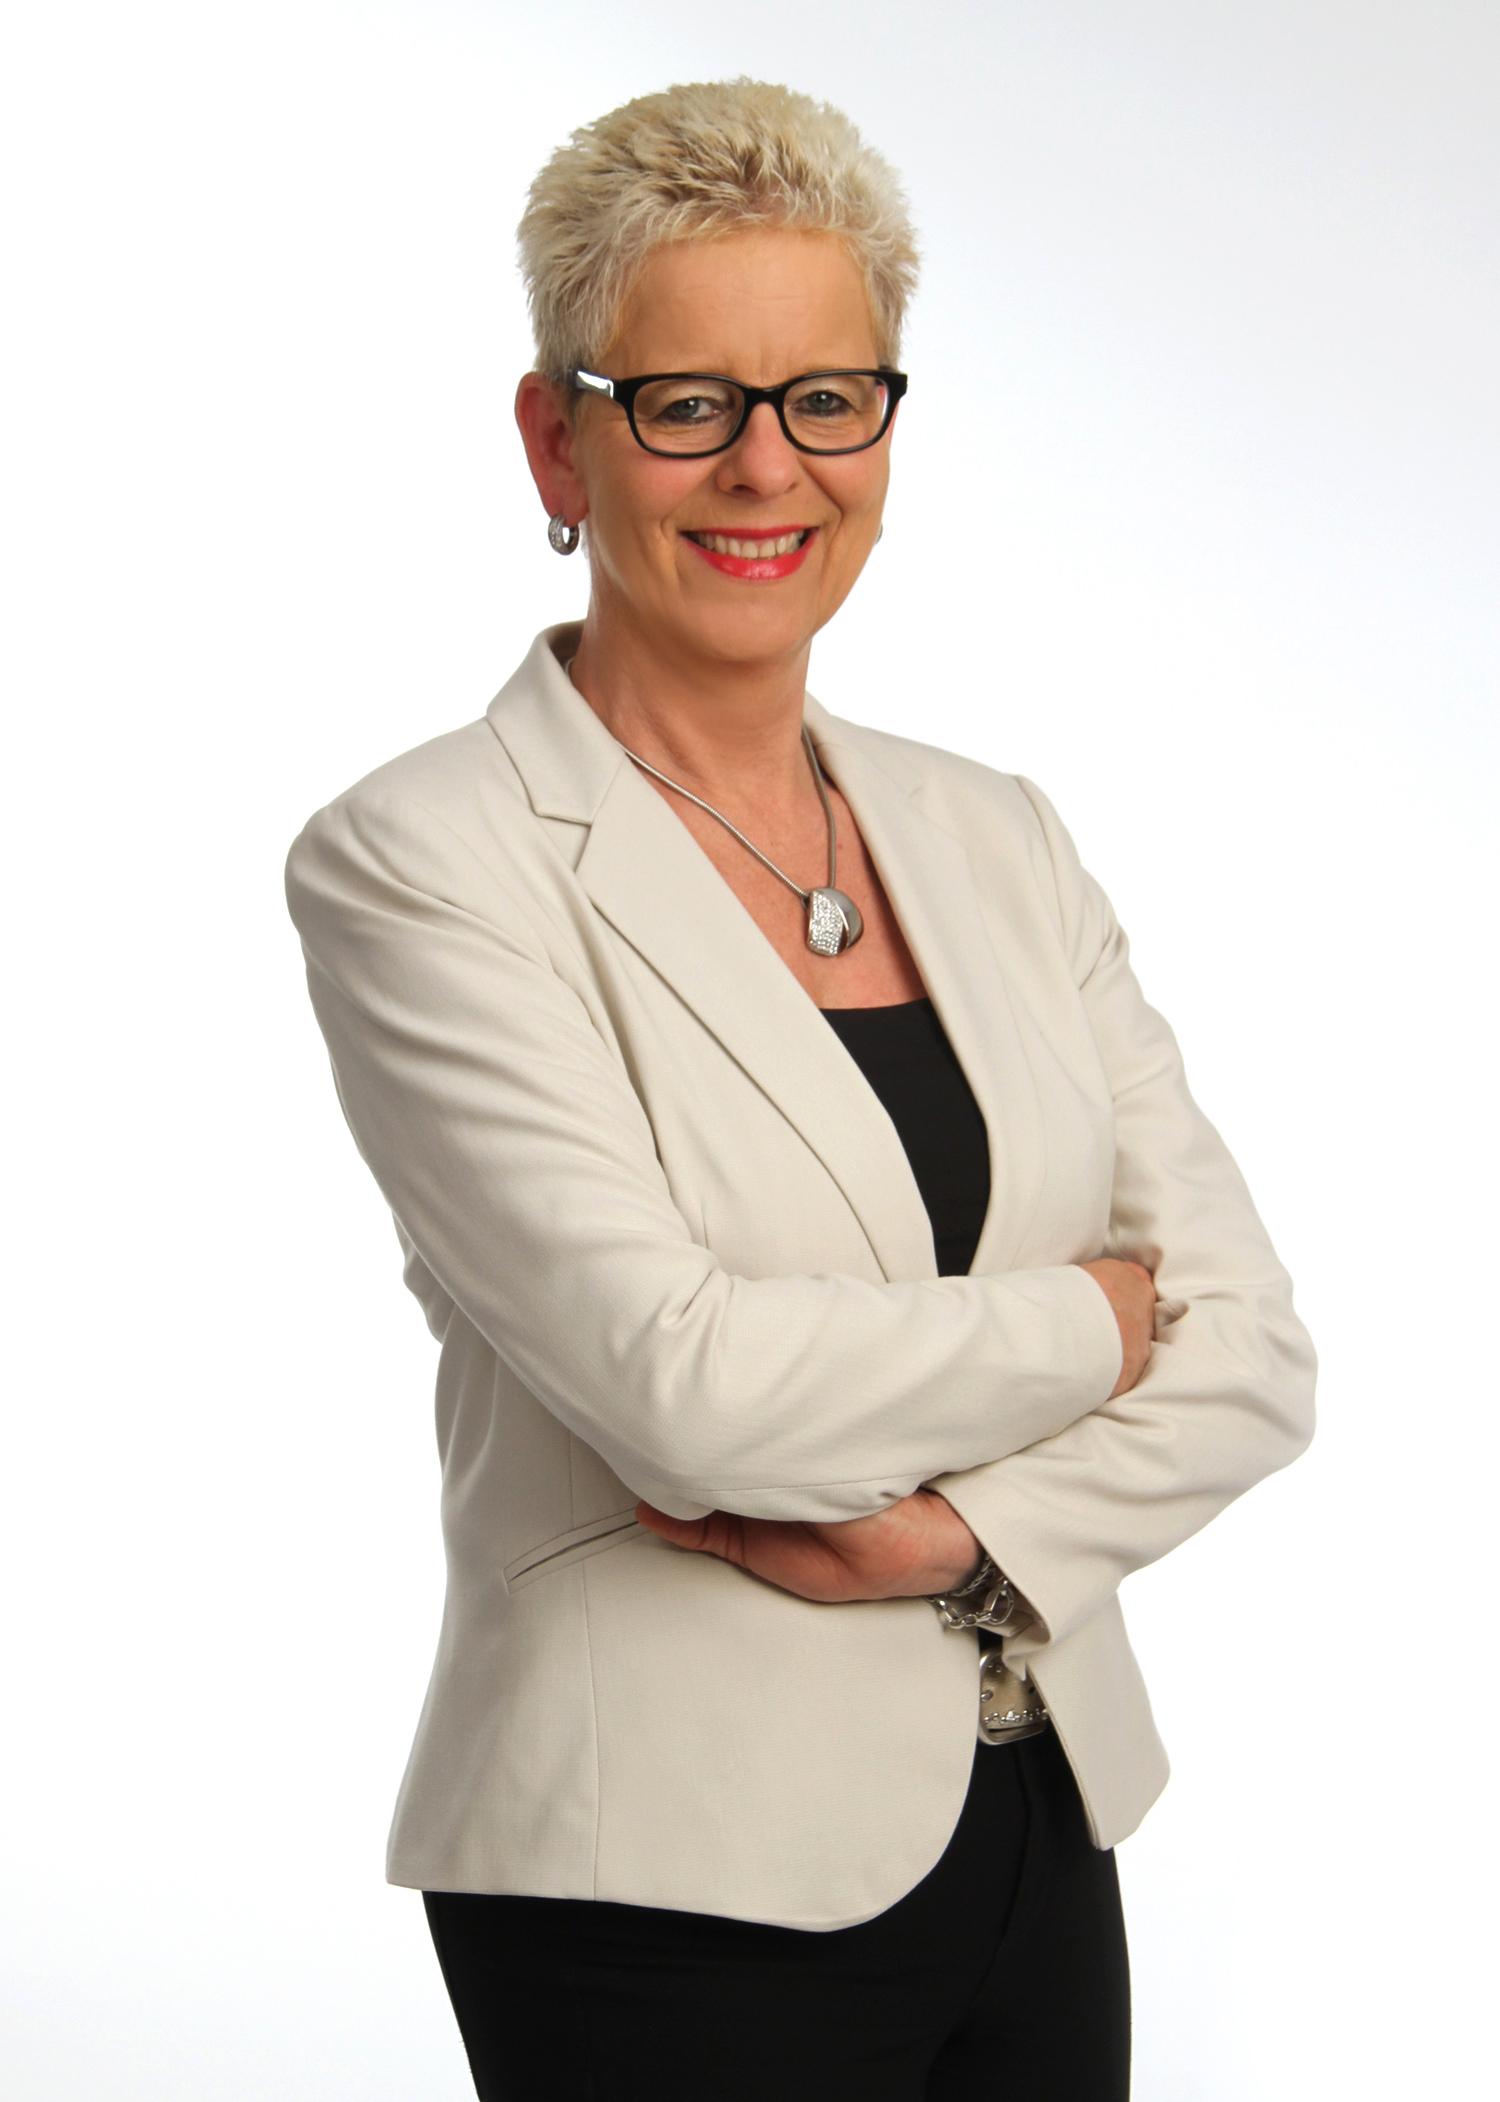 Marion Krause - Marion Krause